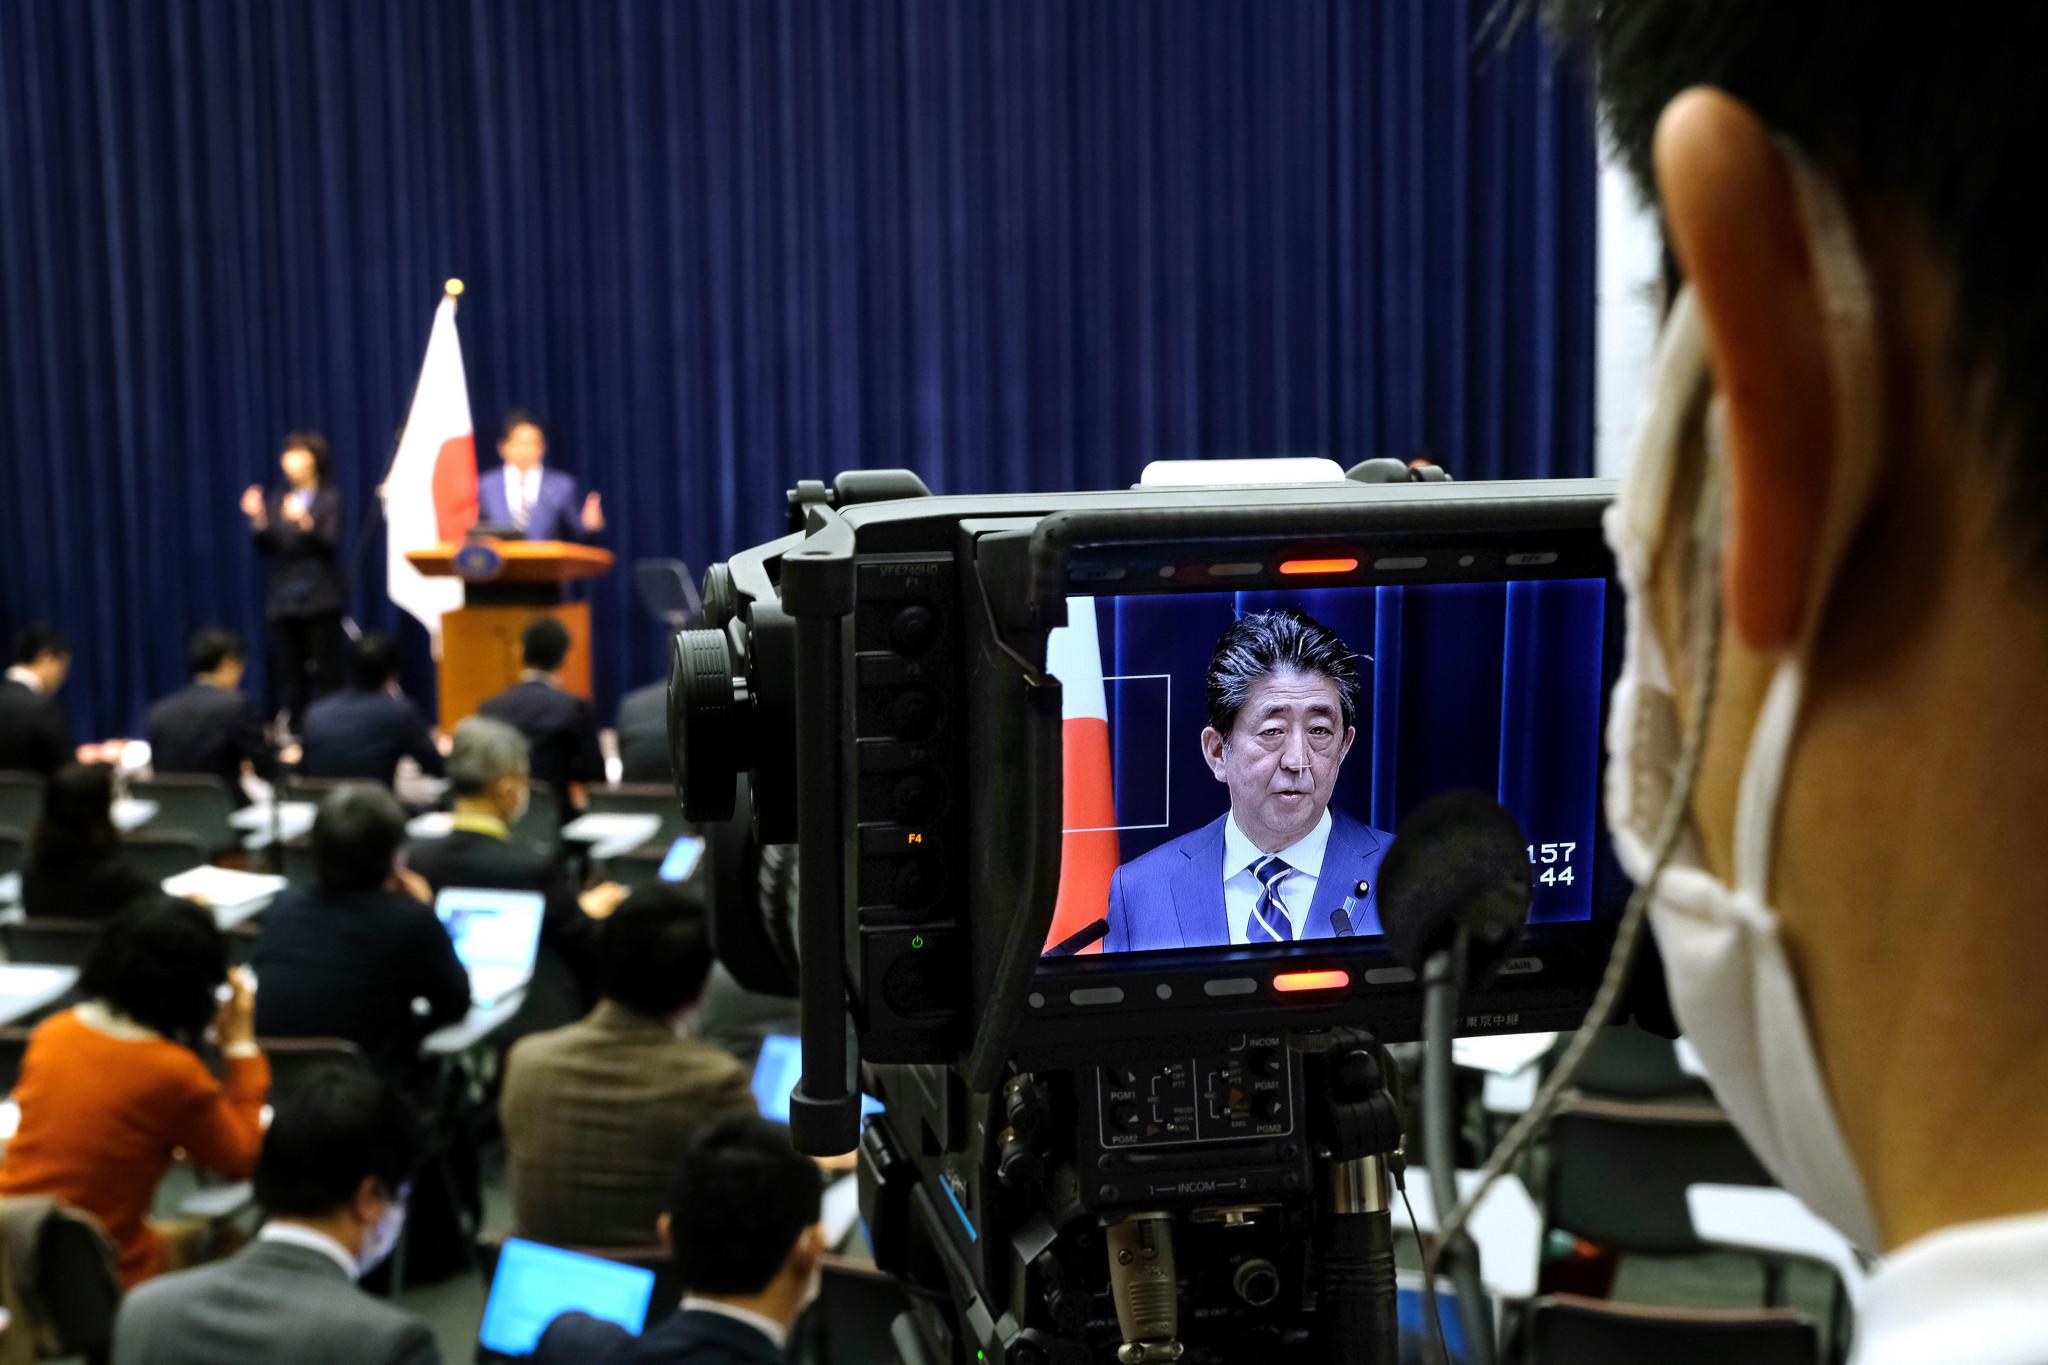 Prime Minister Shinzō Abe says Japan faces a